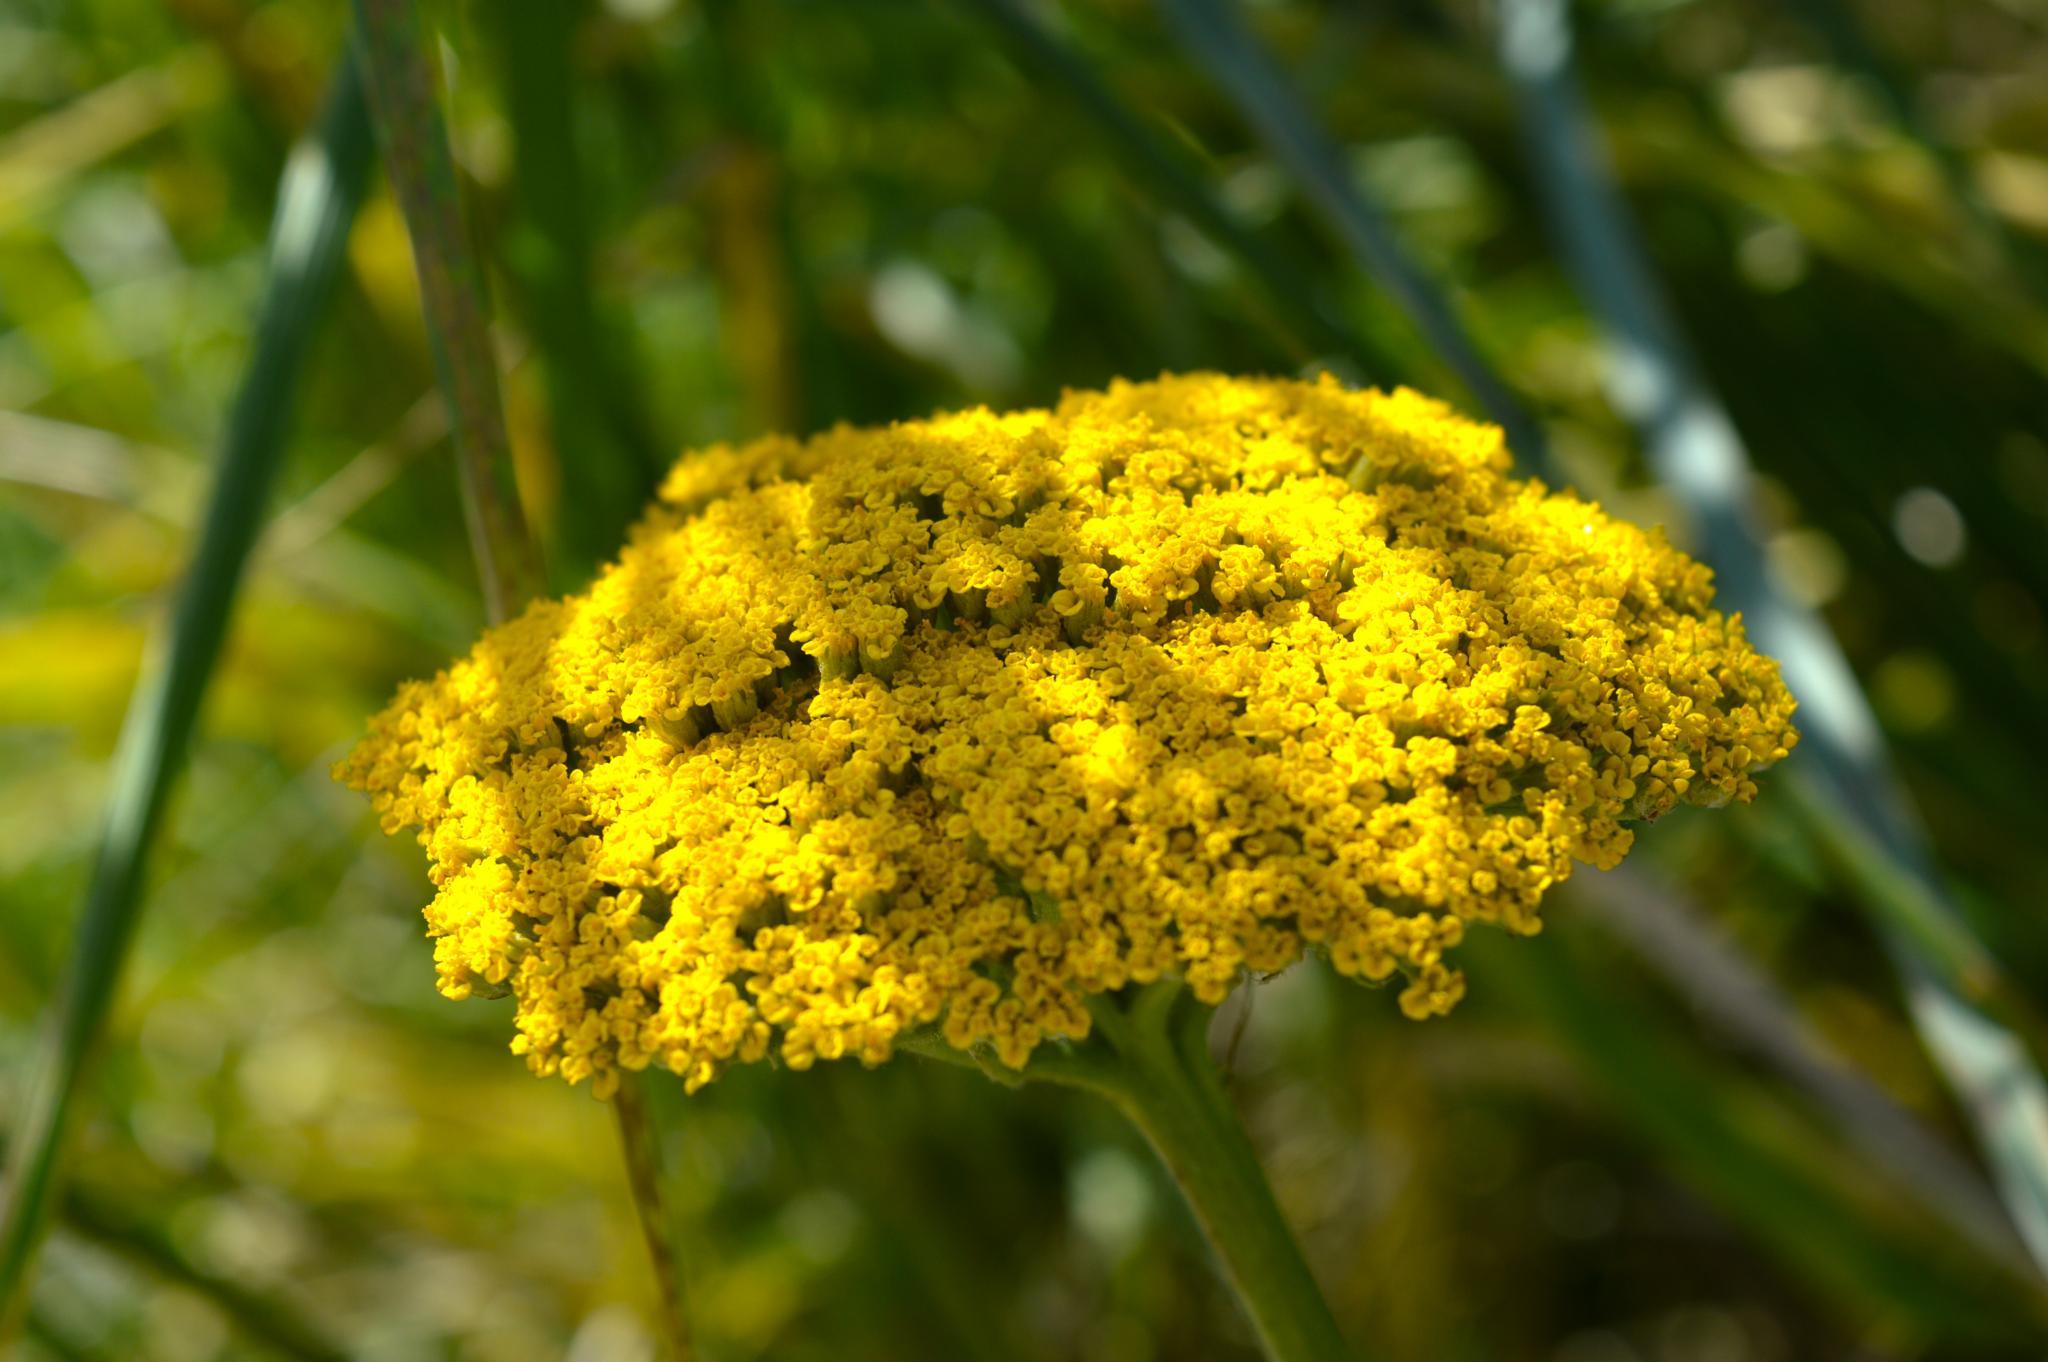 Yellow flower by Ashkan Baharlooe